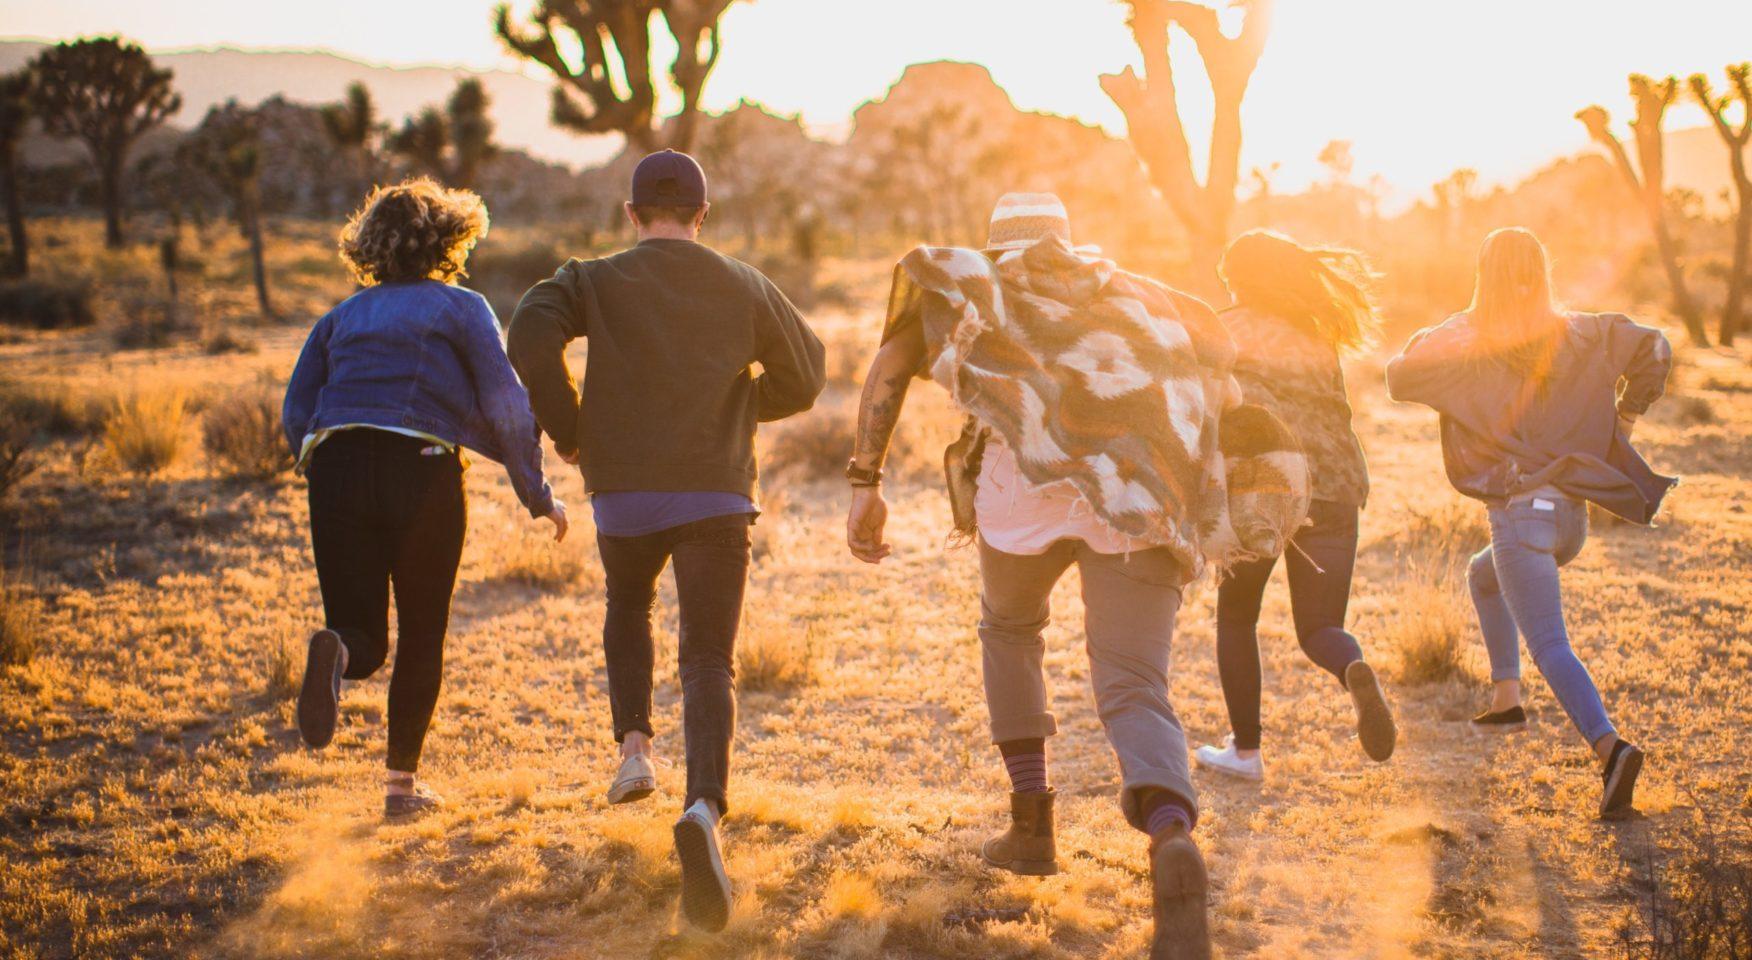 People running through the desert at sunset